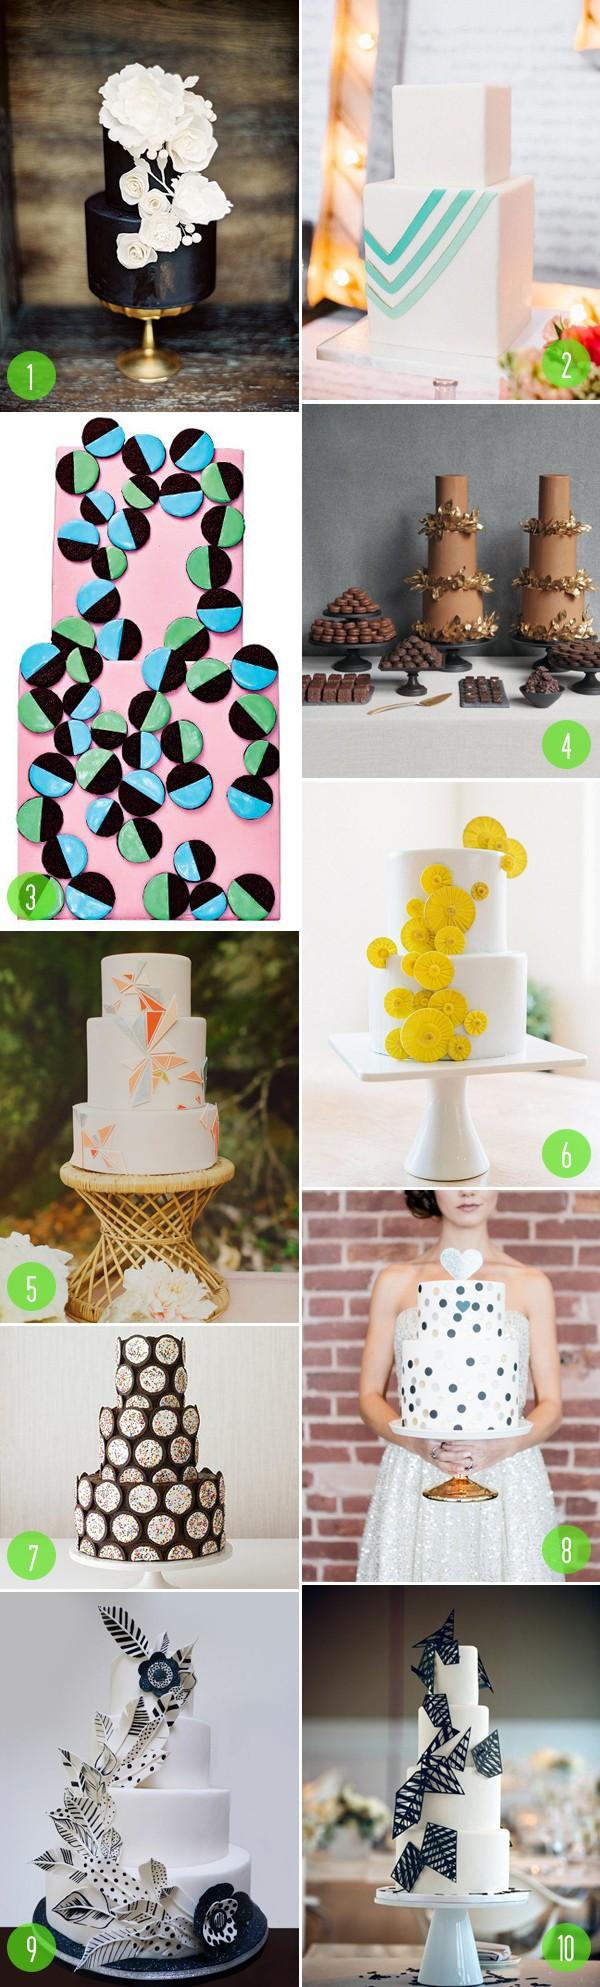 top 10: cakes 8